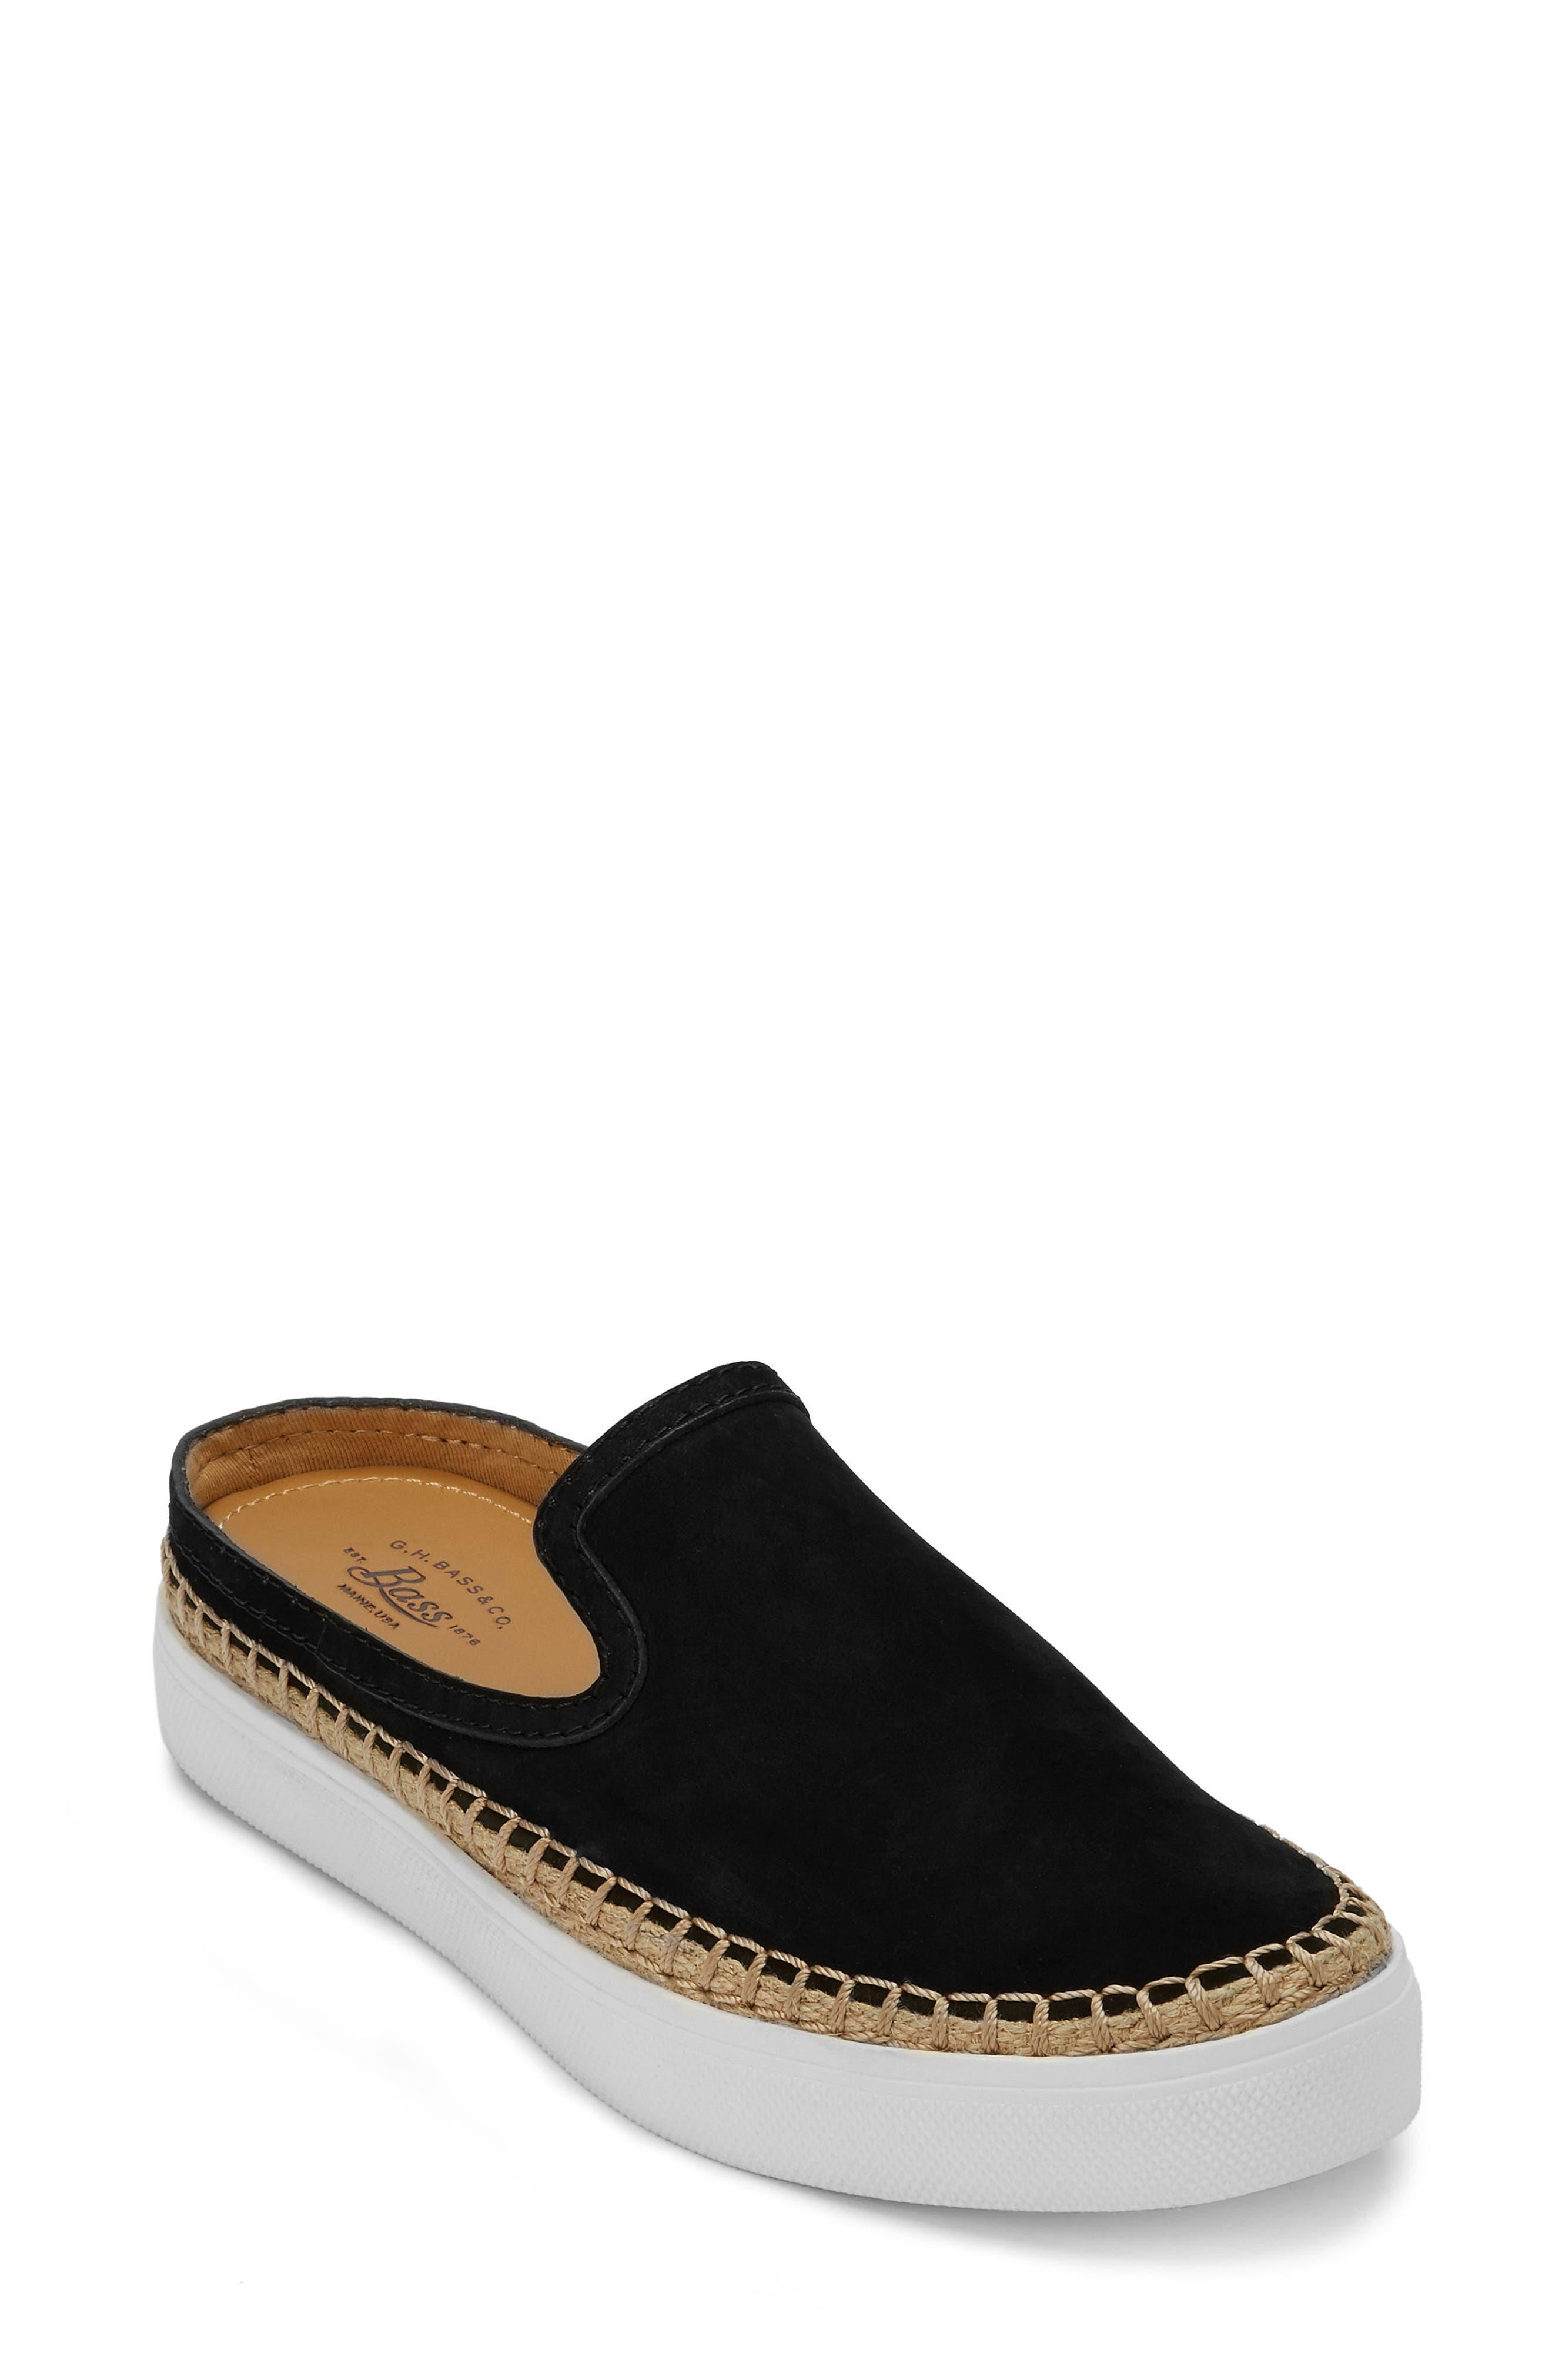 Lola Slip-On Sneaker,                             Main thumbnail 1, color,                             001